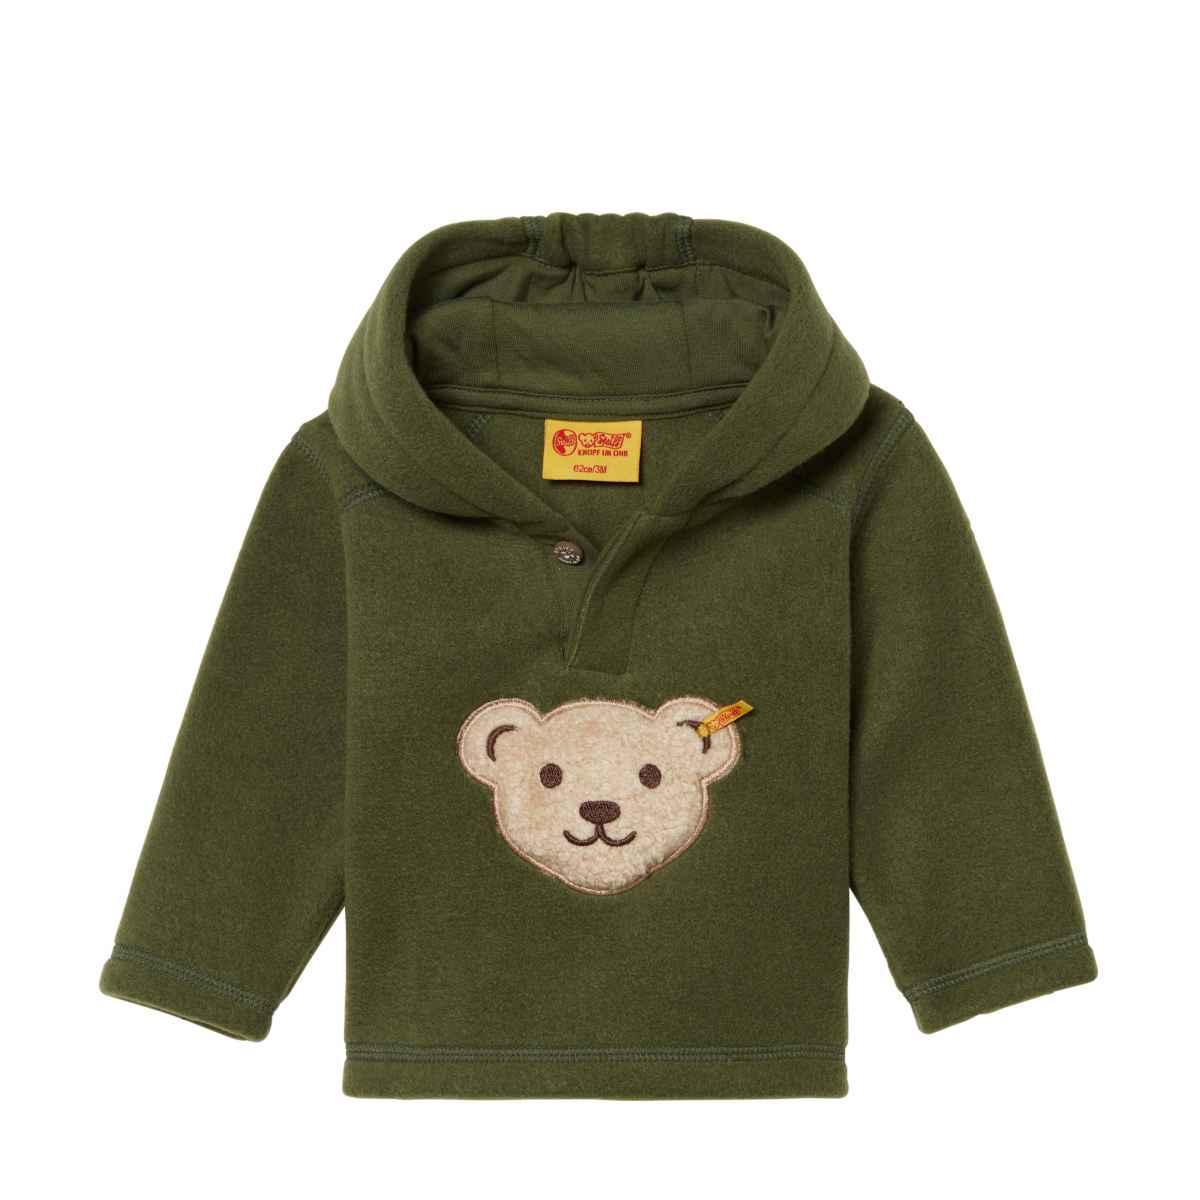 Details zu Steiff Jungen Sweatshirt Pullover Fleece Grün 6843573 Quitscher Gr. 80 104 NEU